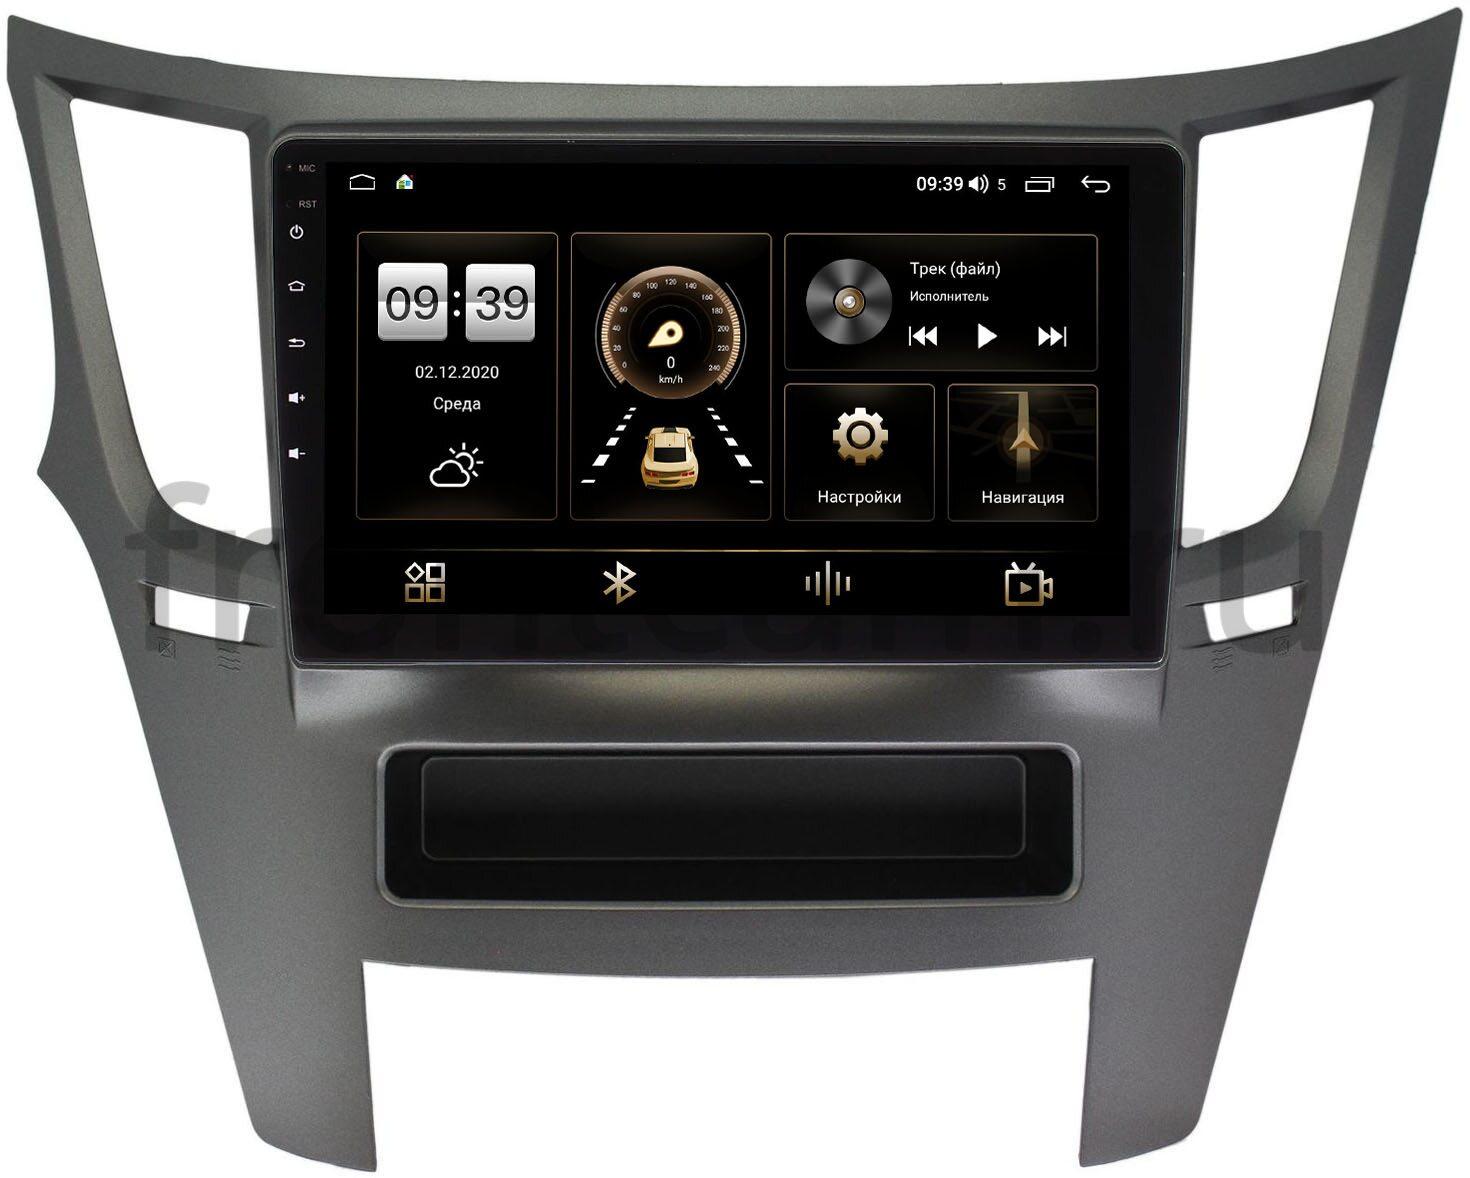 Штатная магнитола Subaru Legacy V 2009-2014, Outback IV 2009-2014 LeTrun 4166-9051 на Android 10 (4G-SIM, 3/32, DSP, QLed) (+ Камера заднего вида в подарок!)